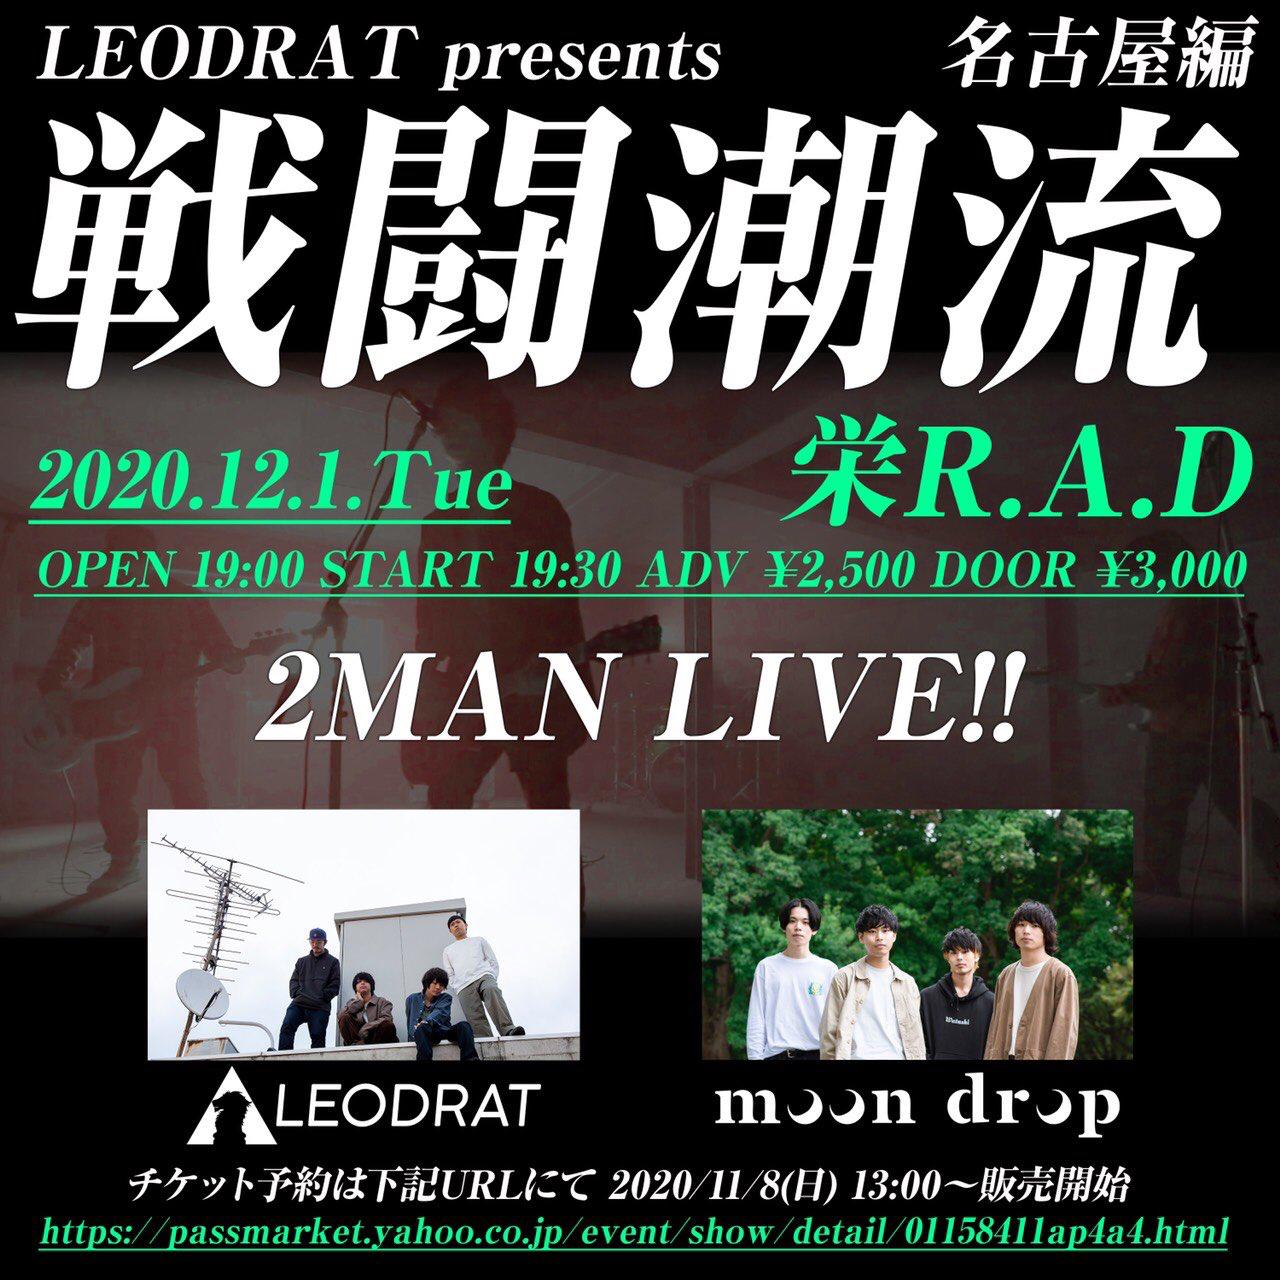 LEODRAT pre. 戦闘潮流〜名古屋編〜